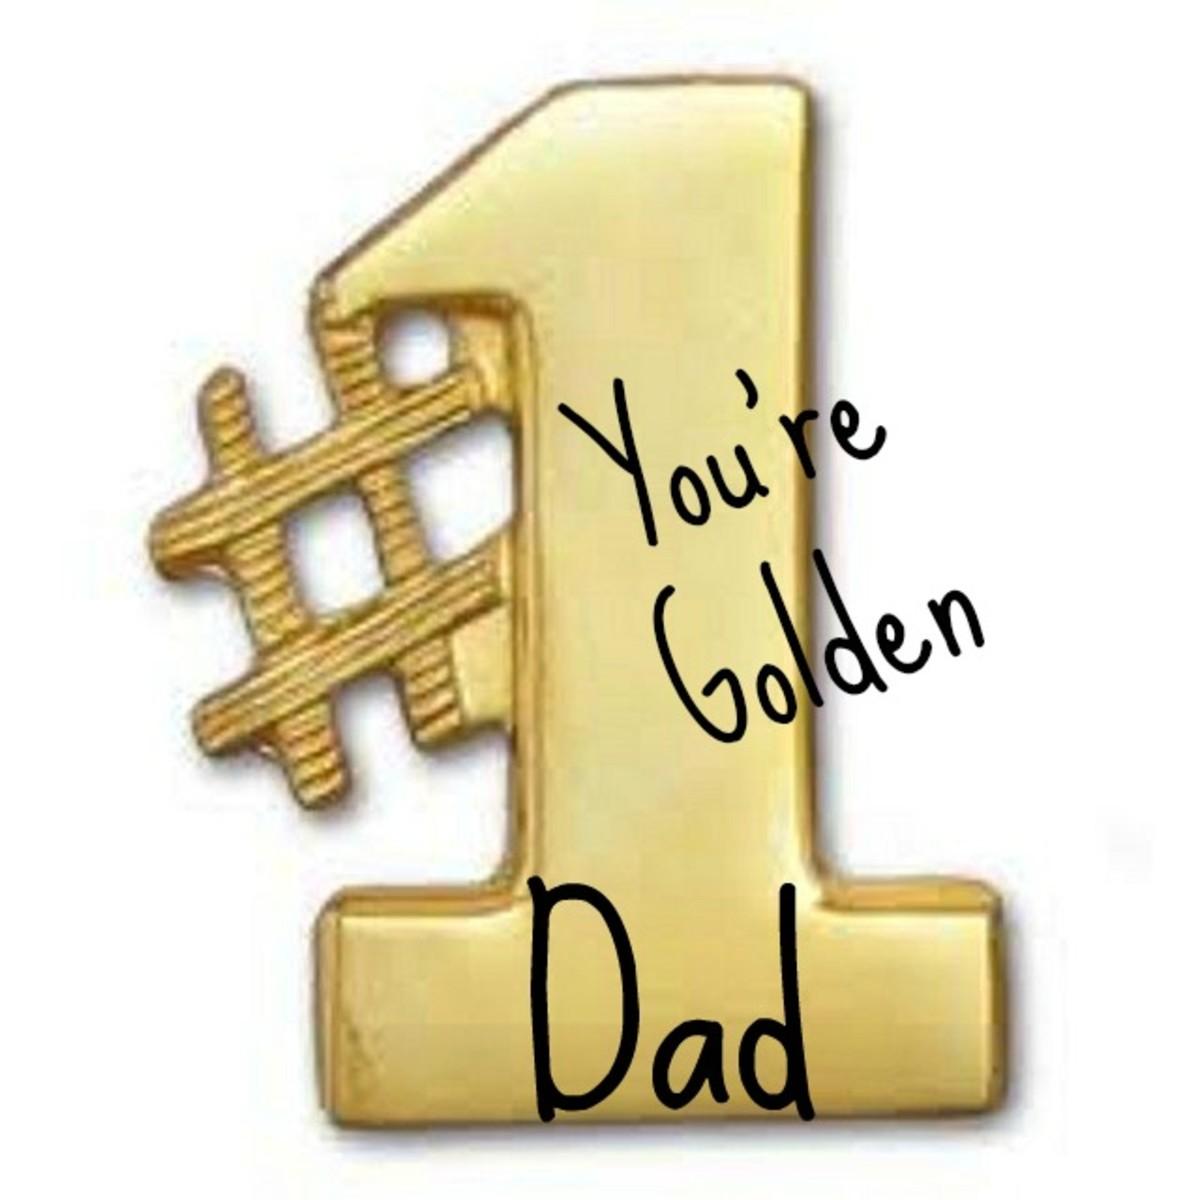 Golden #1 Dad Clip Art